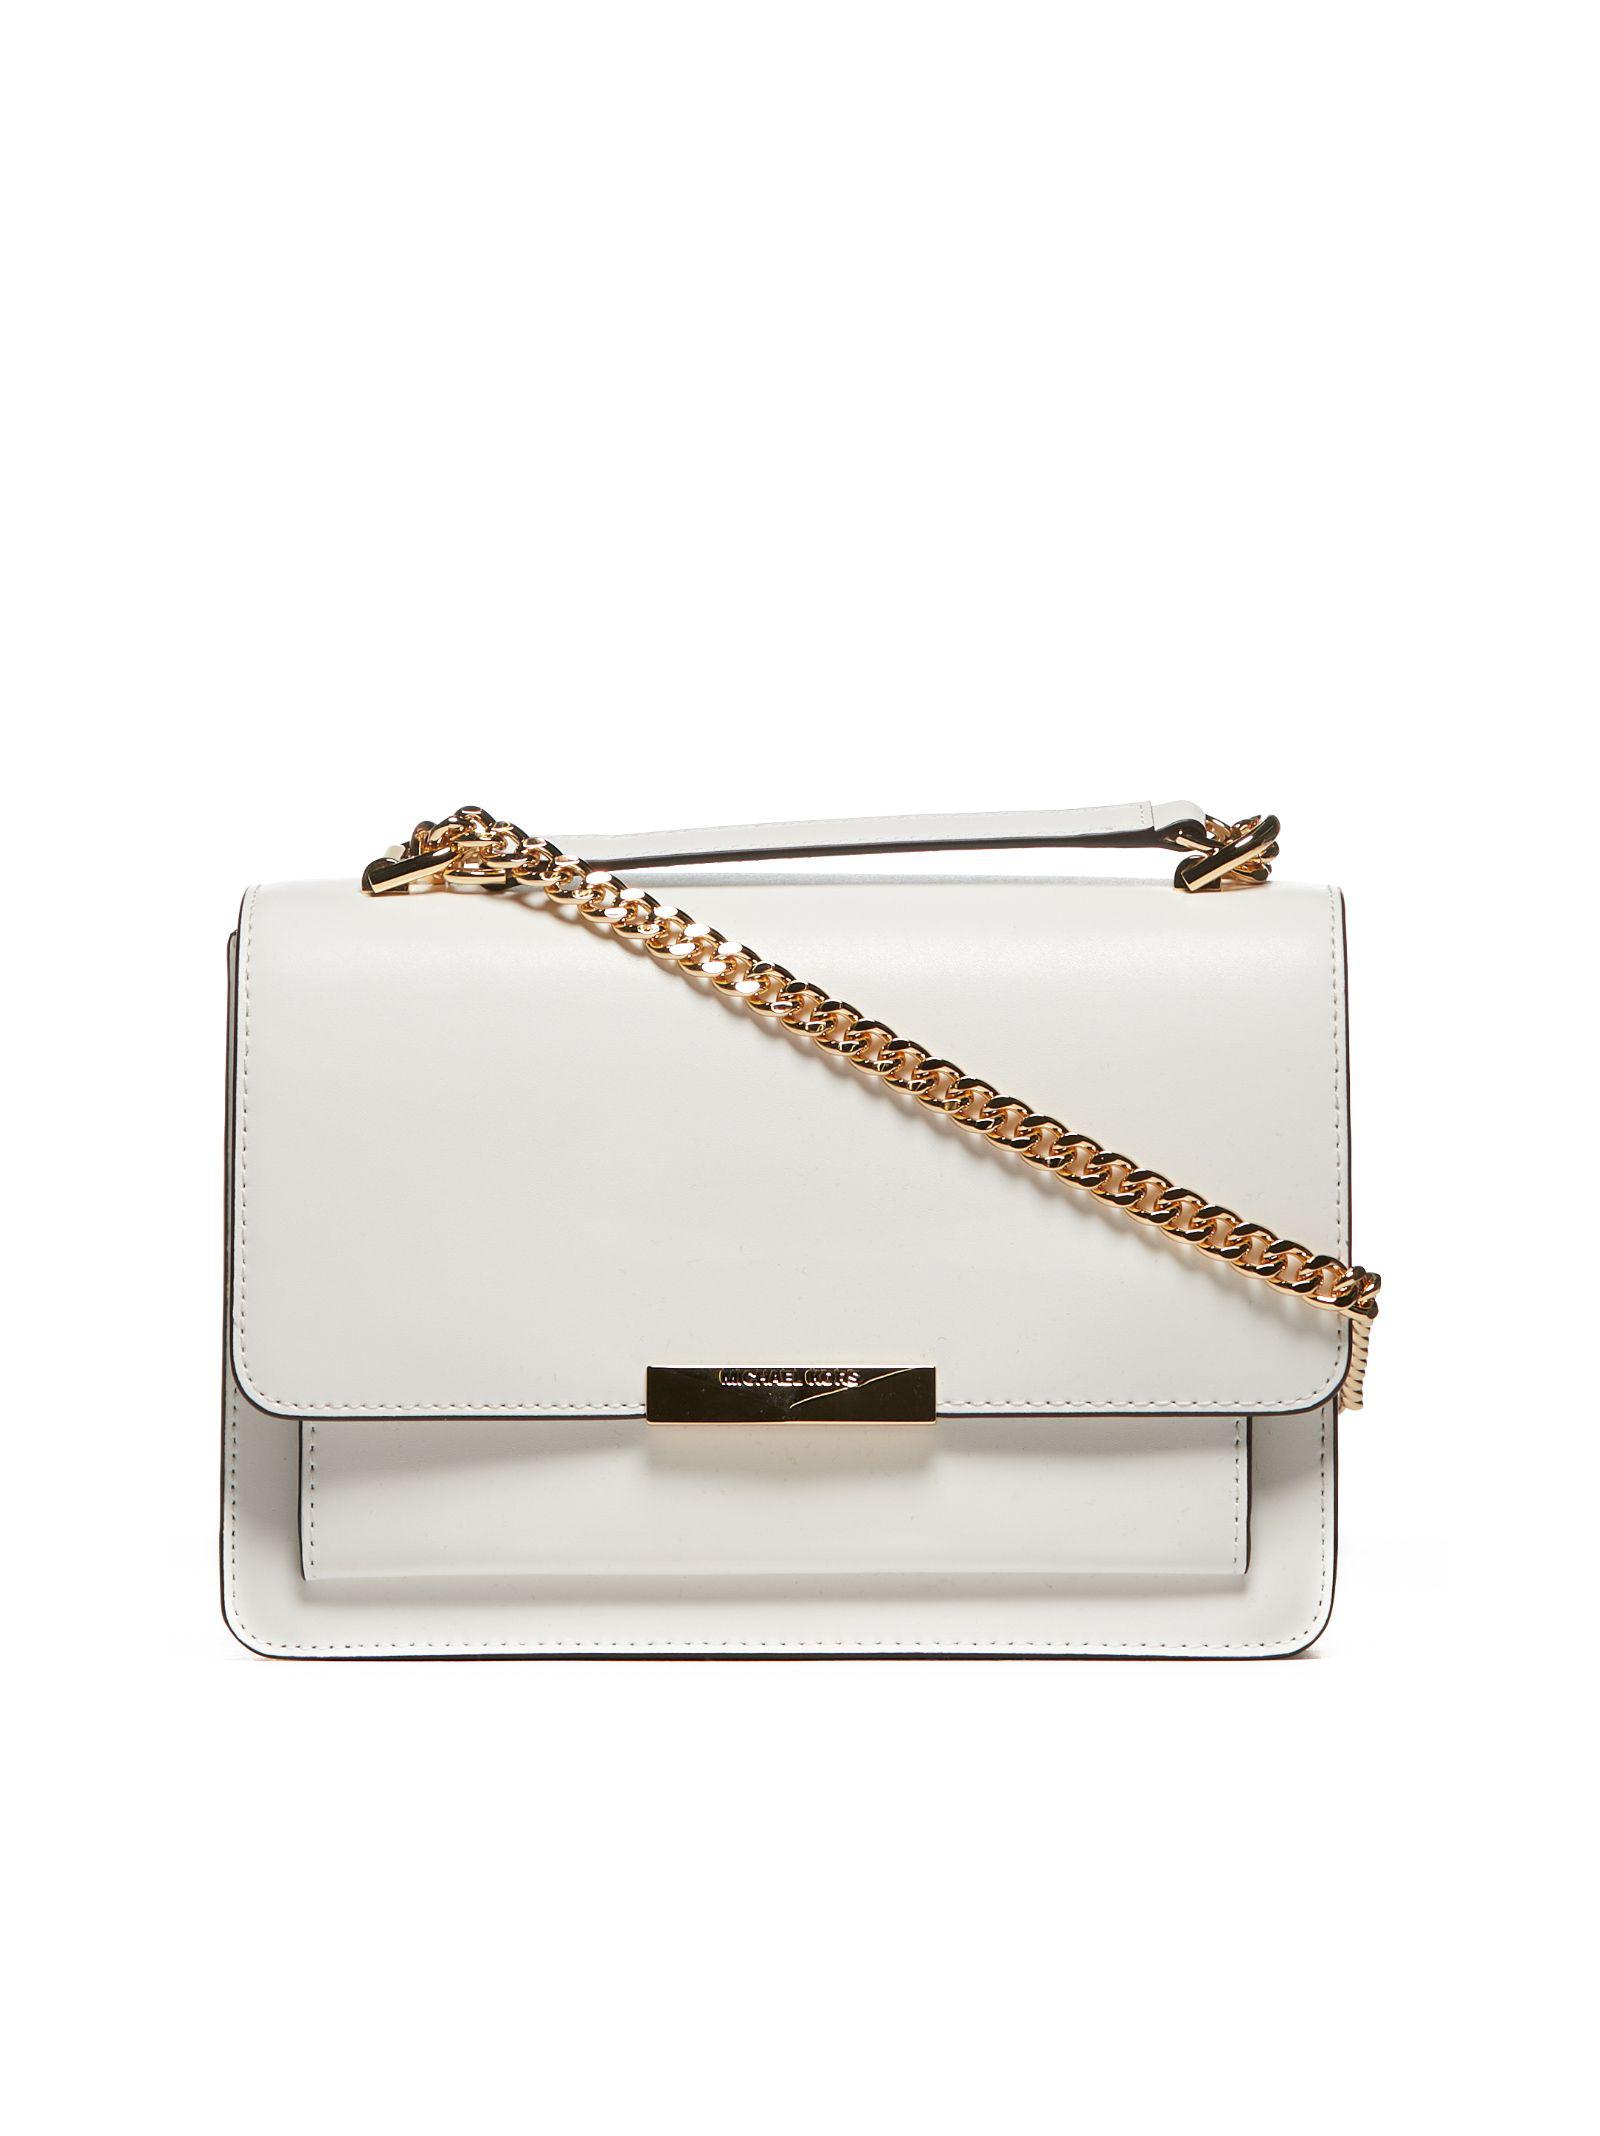 c72d708316a Michael Michael Kors Jade Chain Shoulder Bag In Bianco